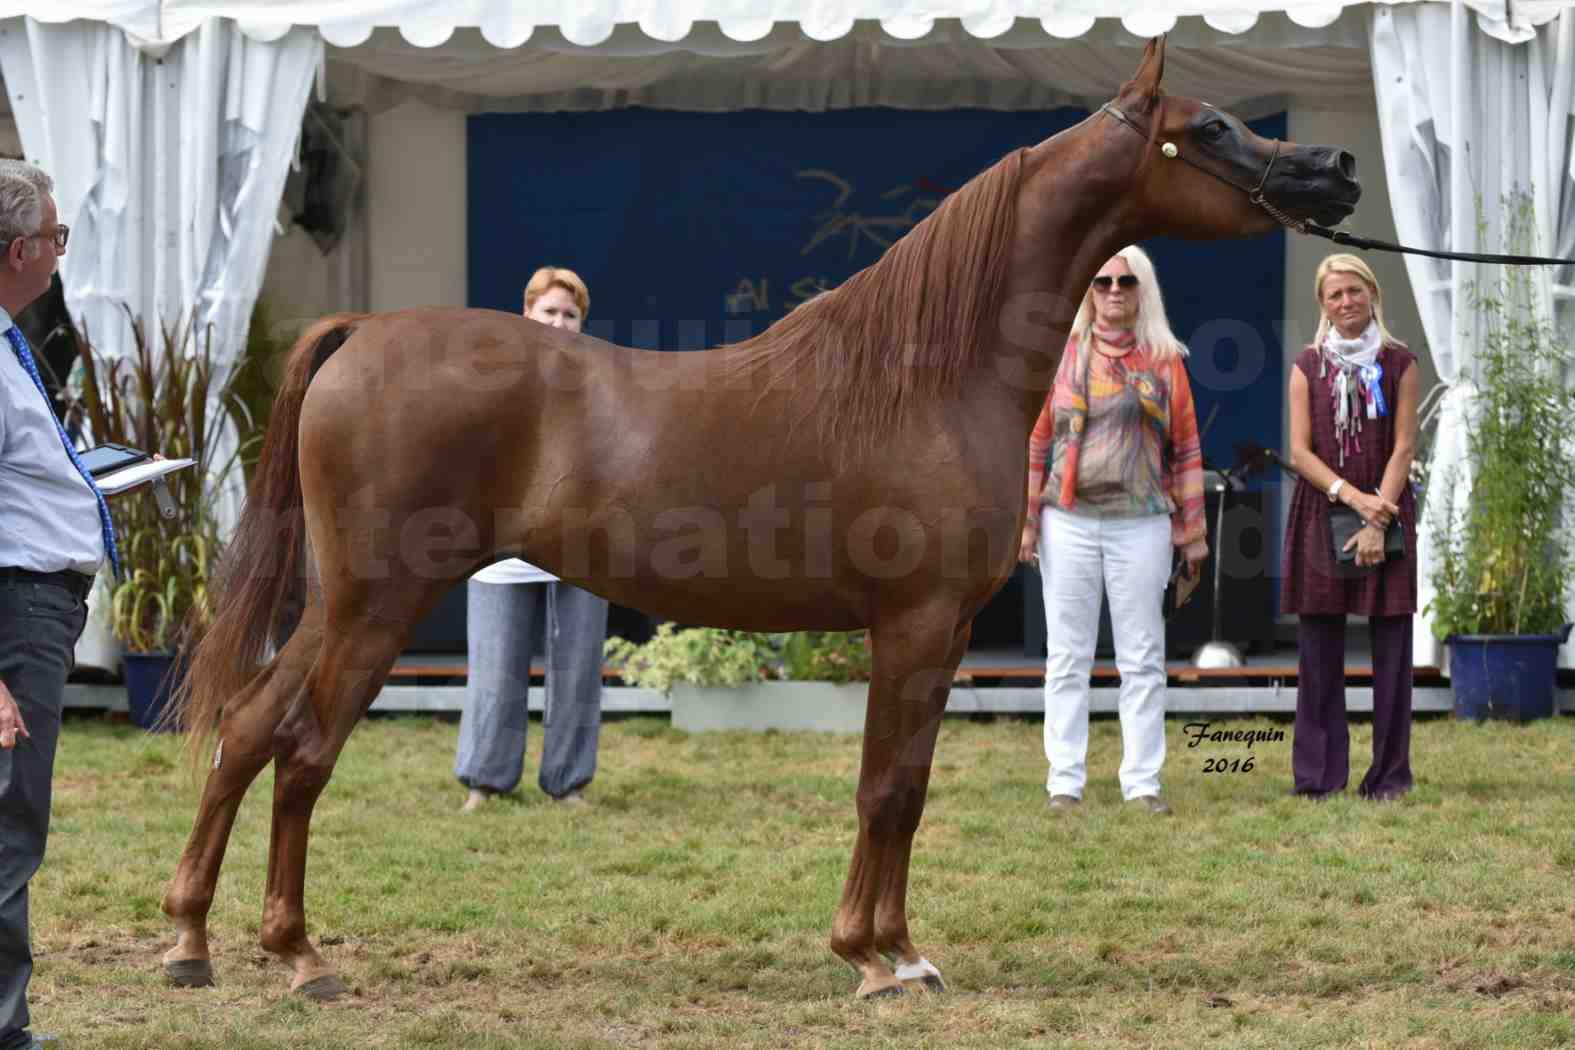 International Arabian Horse Show B de VICHY 2016 - PEARL DE DJOON - Notre Sélection - 40